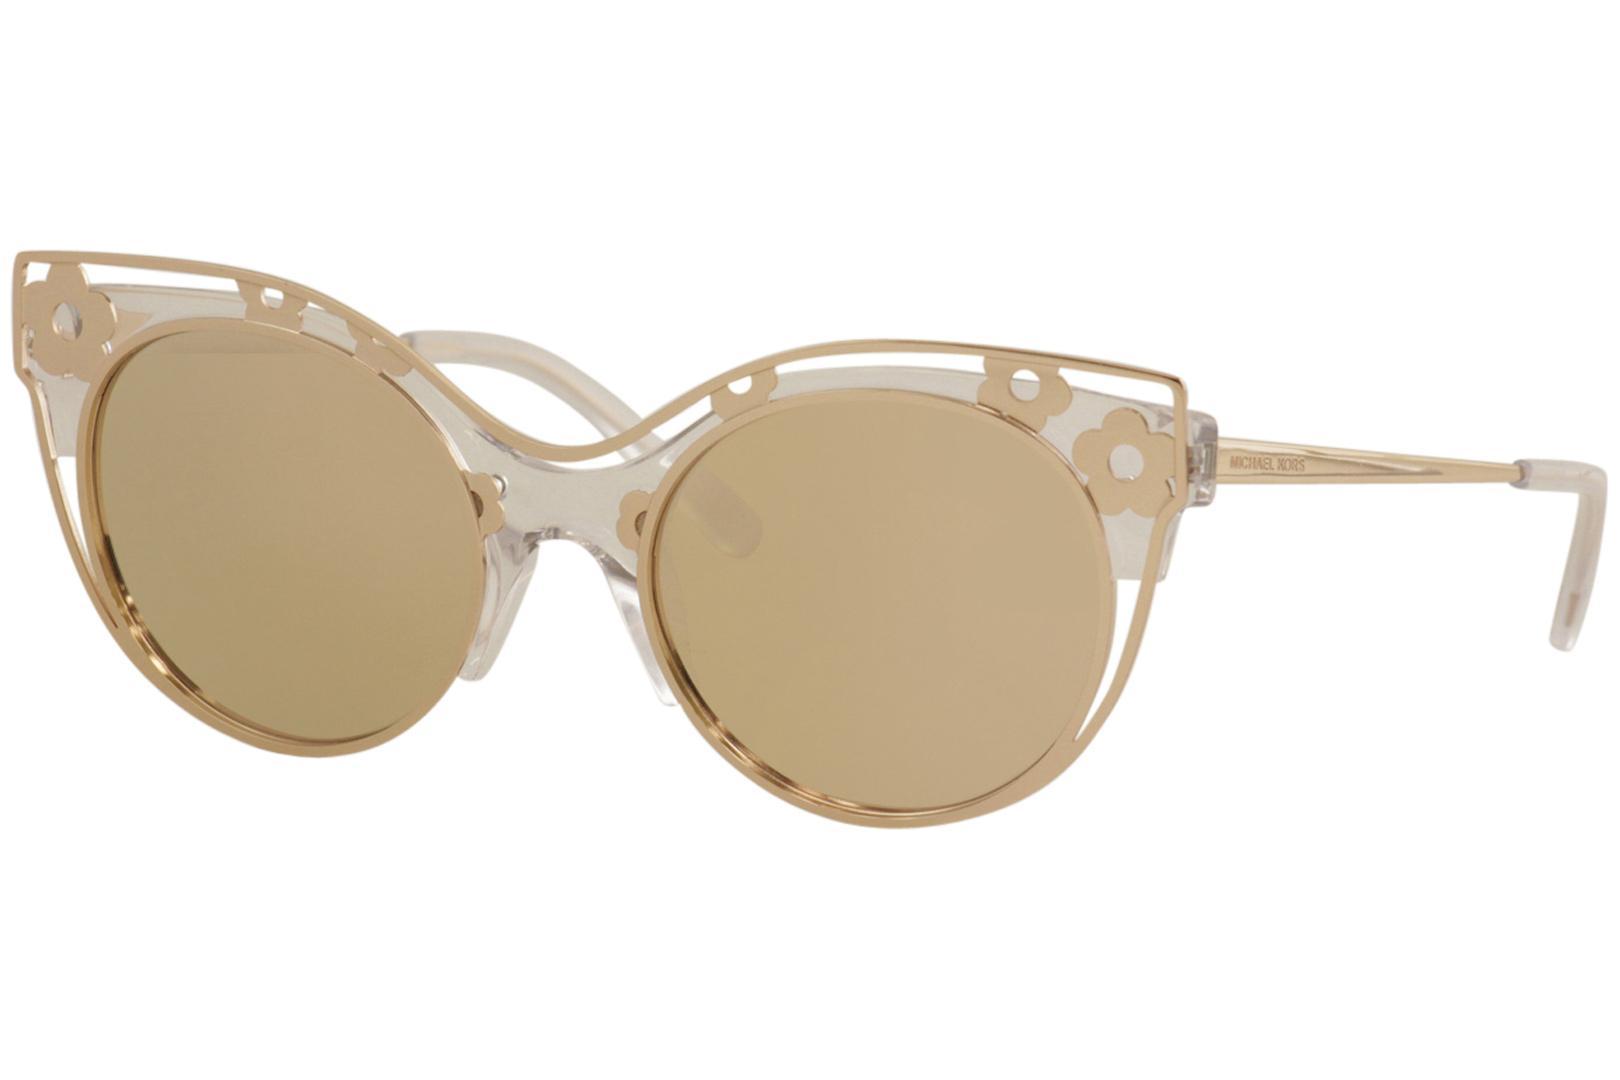 44efaae52878 Michael Kors Women's Melbourne MK1038 MK/1038 Fashion Cat Eye Sunglasses by Michael  Kors. Touch to zoom